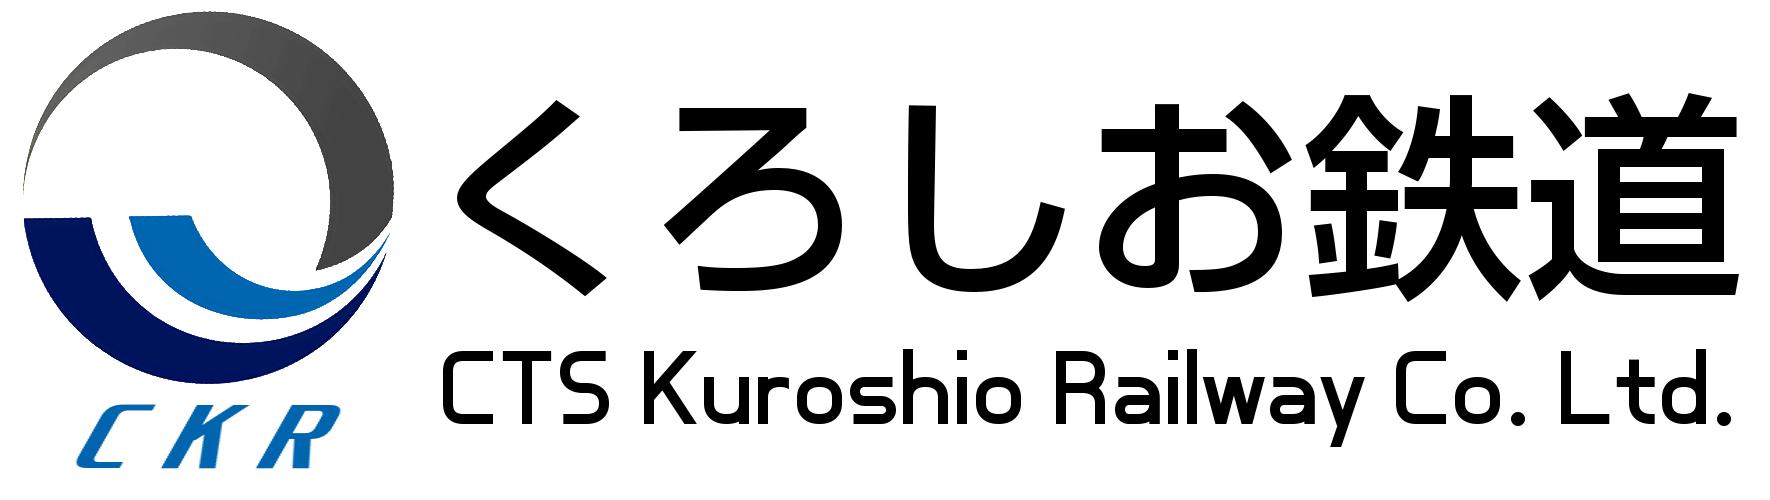 CKR_logo.png